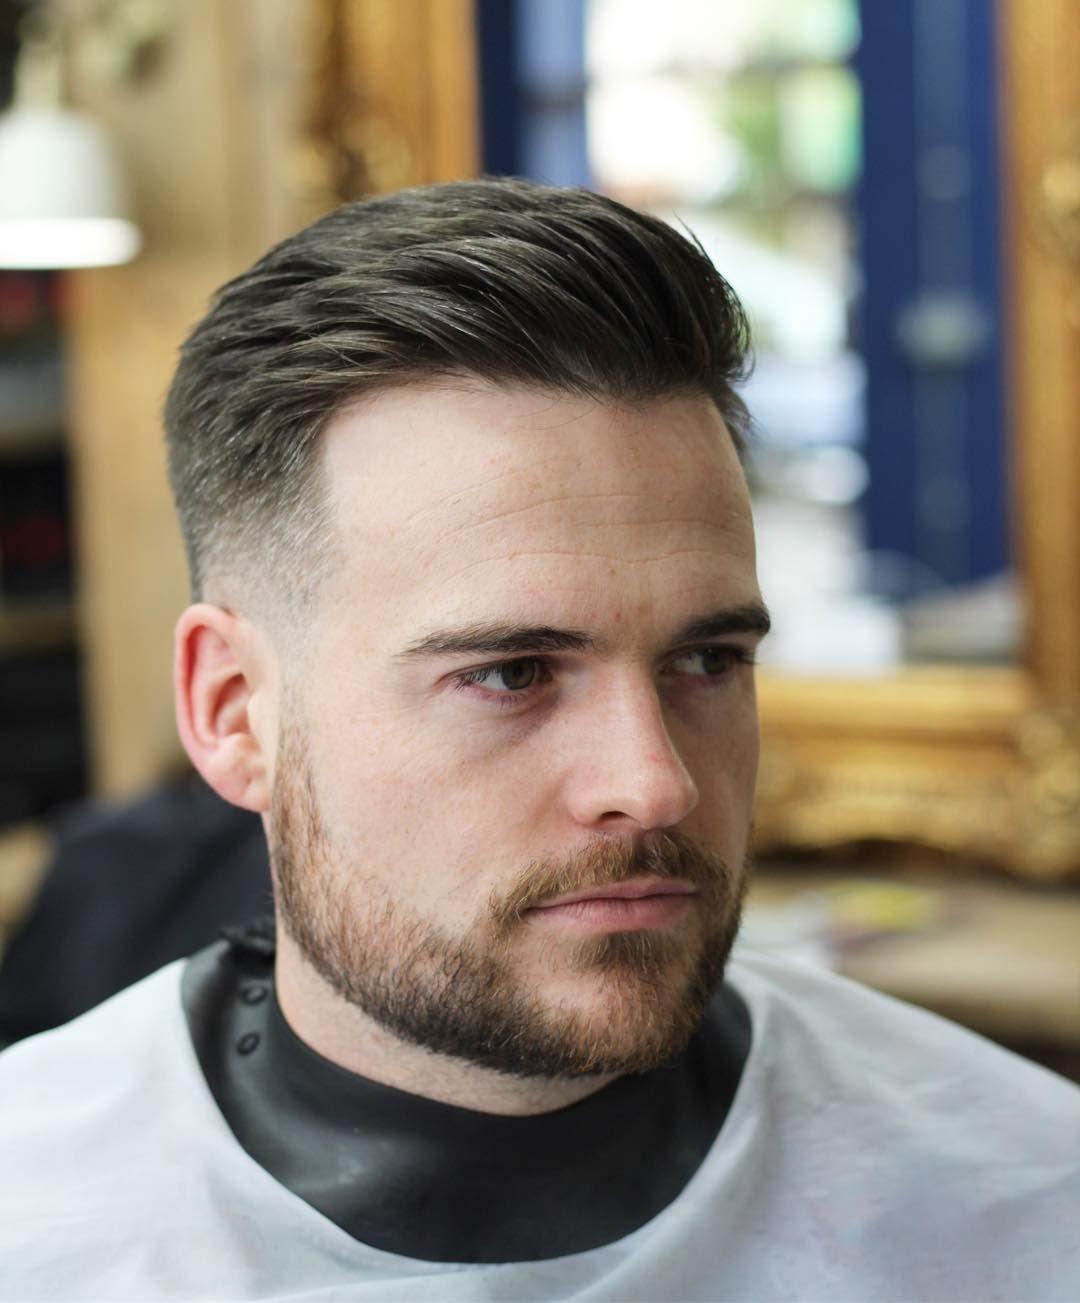 Where Can I Get A Haircut Near Me - The Best Haircut Of 2018